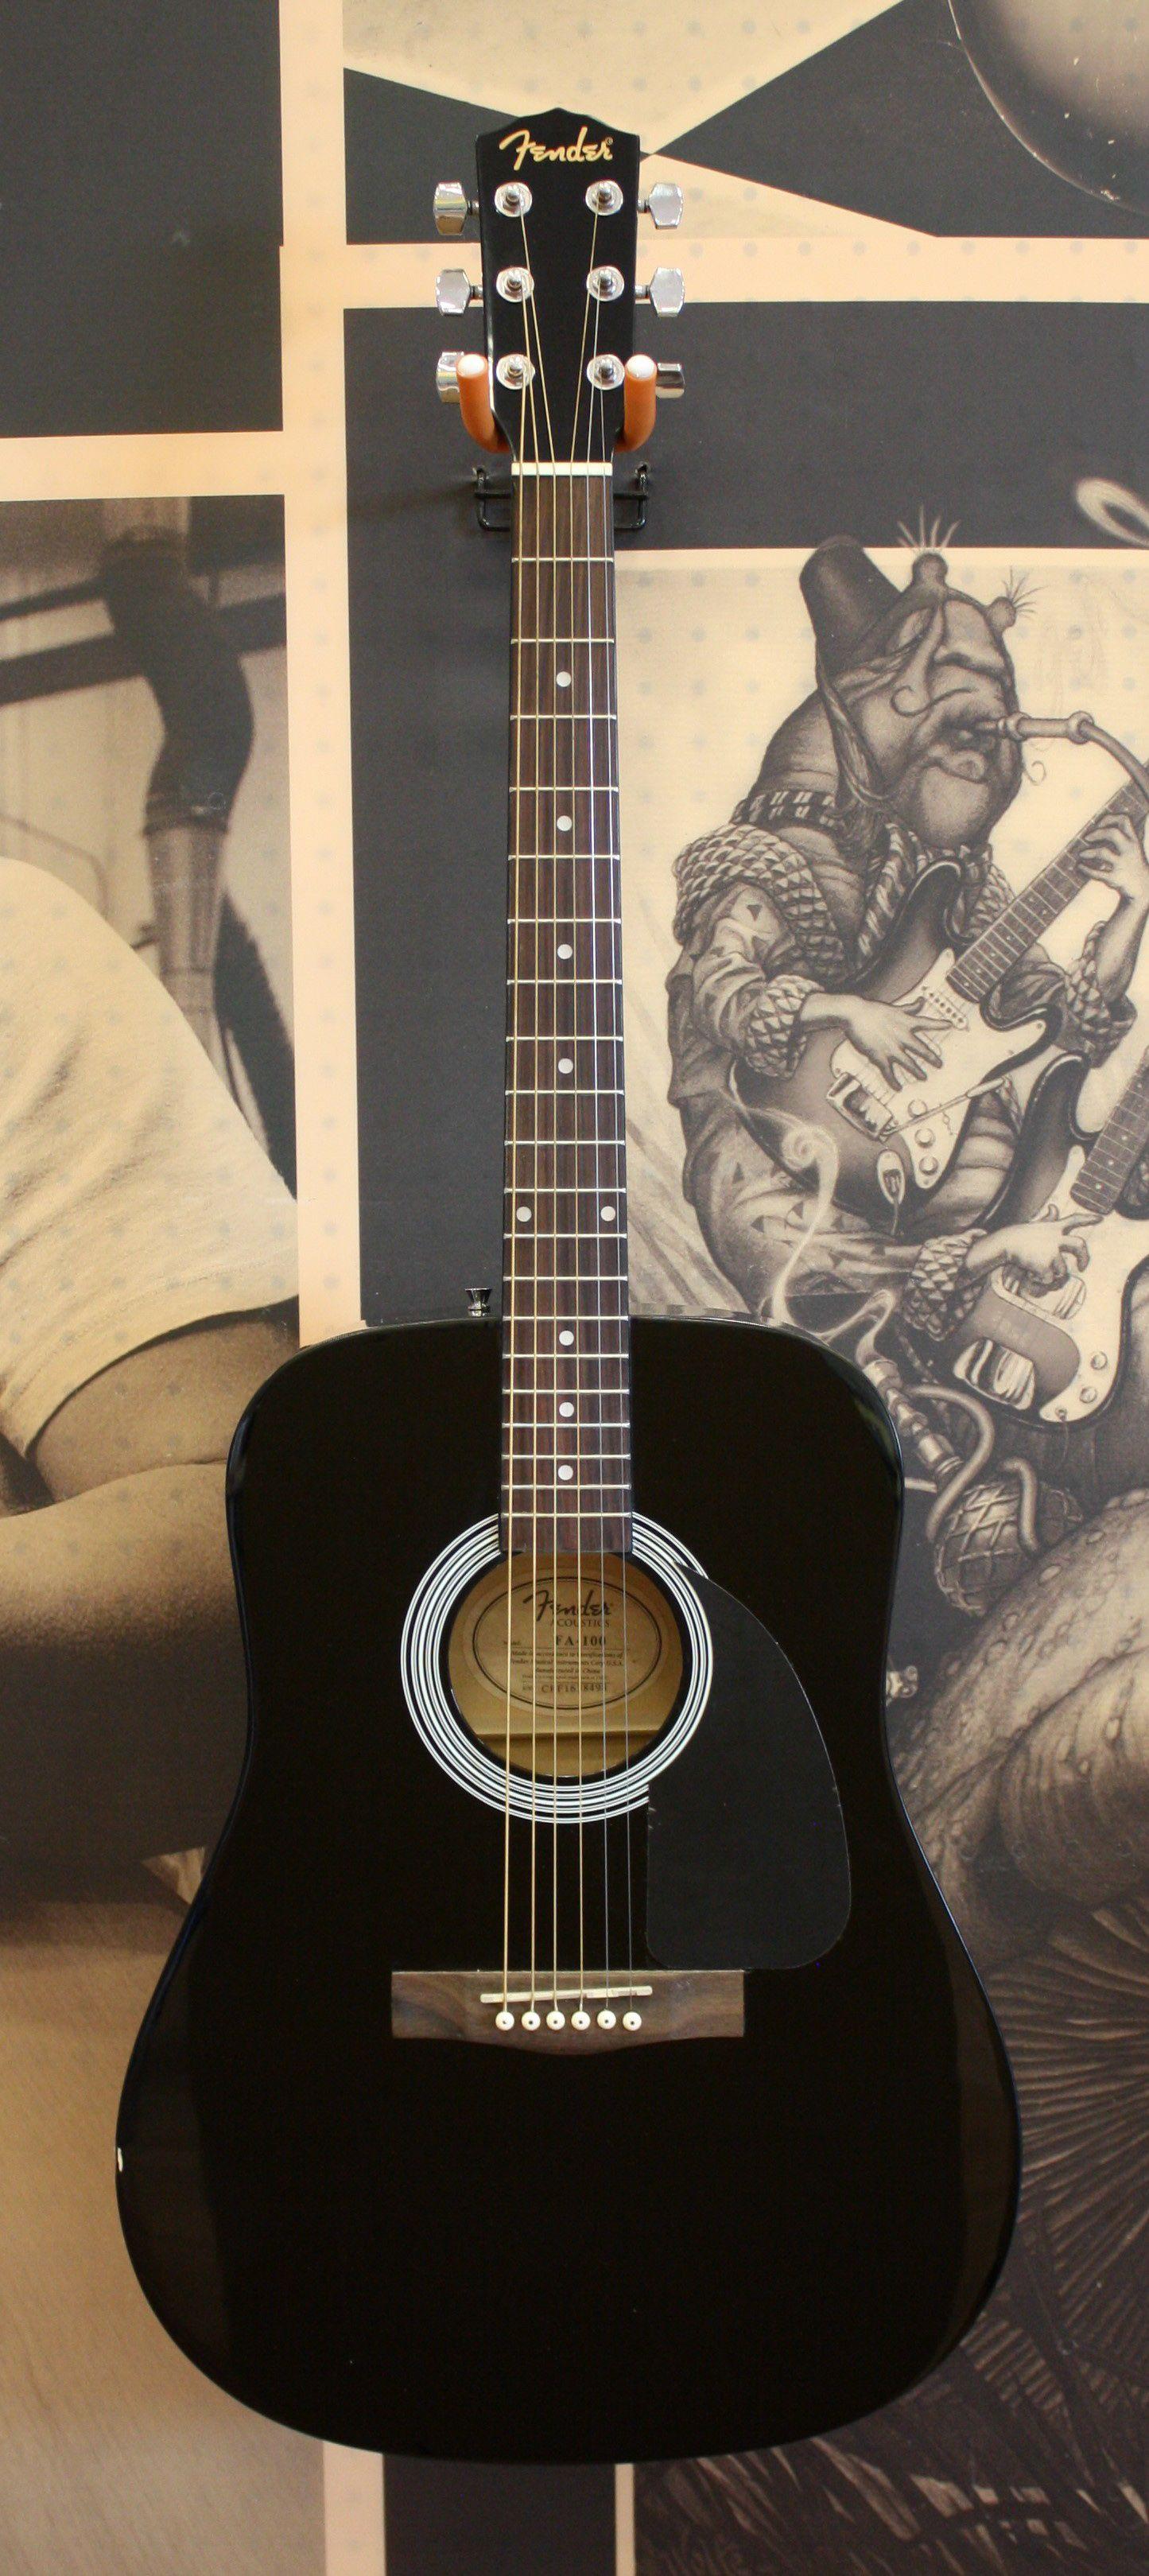 Fender Fa 100 Dreadnought Acoustic Guitar Black Acoustic Guitar For Sale Guitars For Sale Guitar